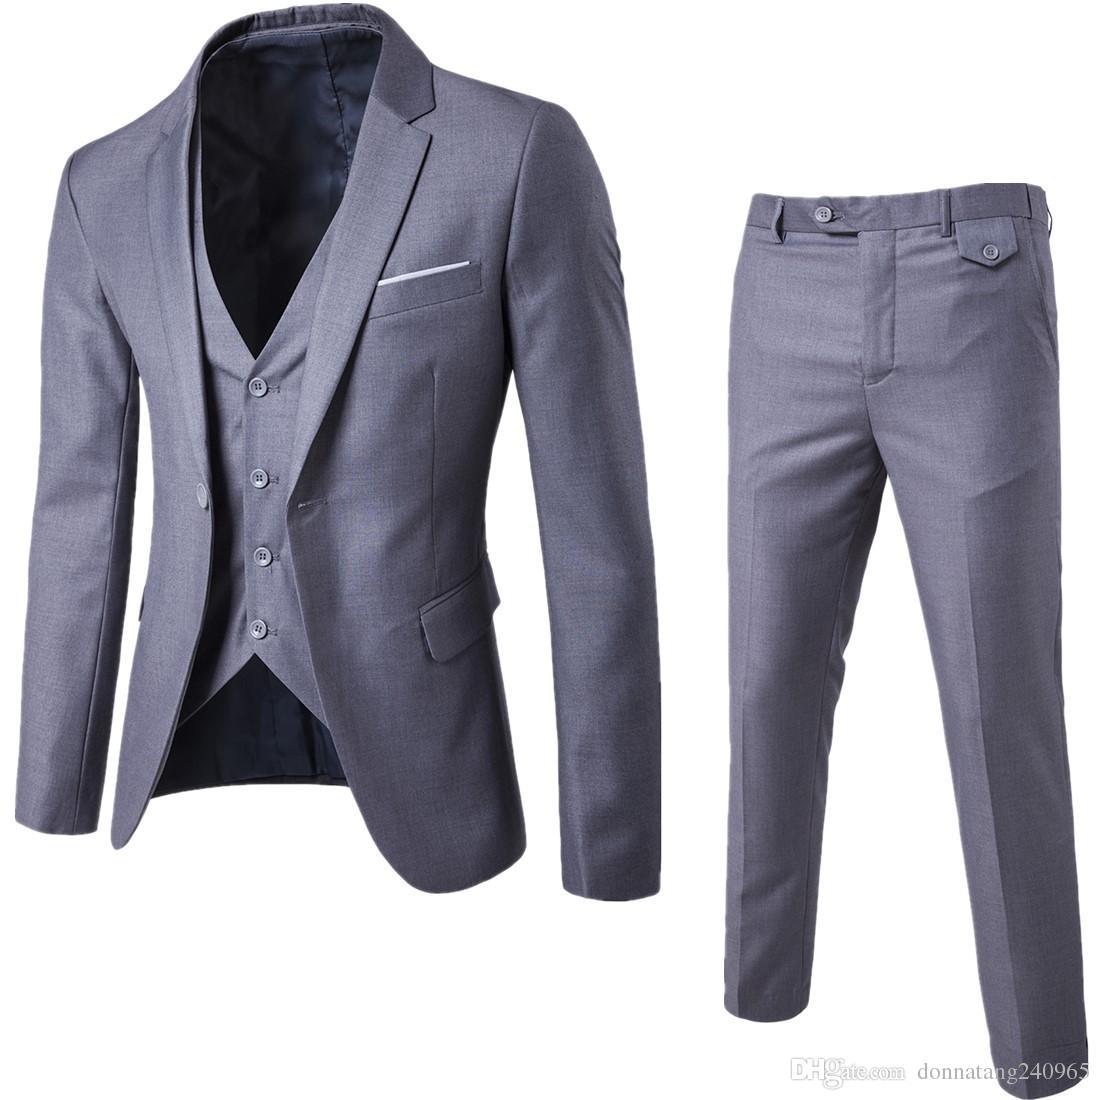 2018 2017 New Fashion Designer Men Suit Groom Tuxedos